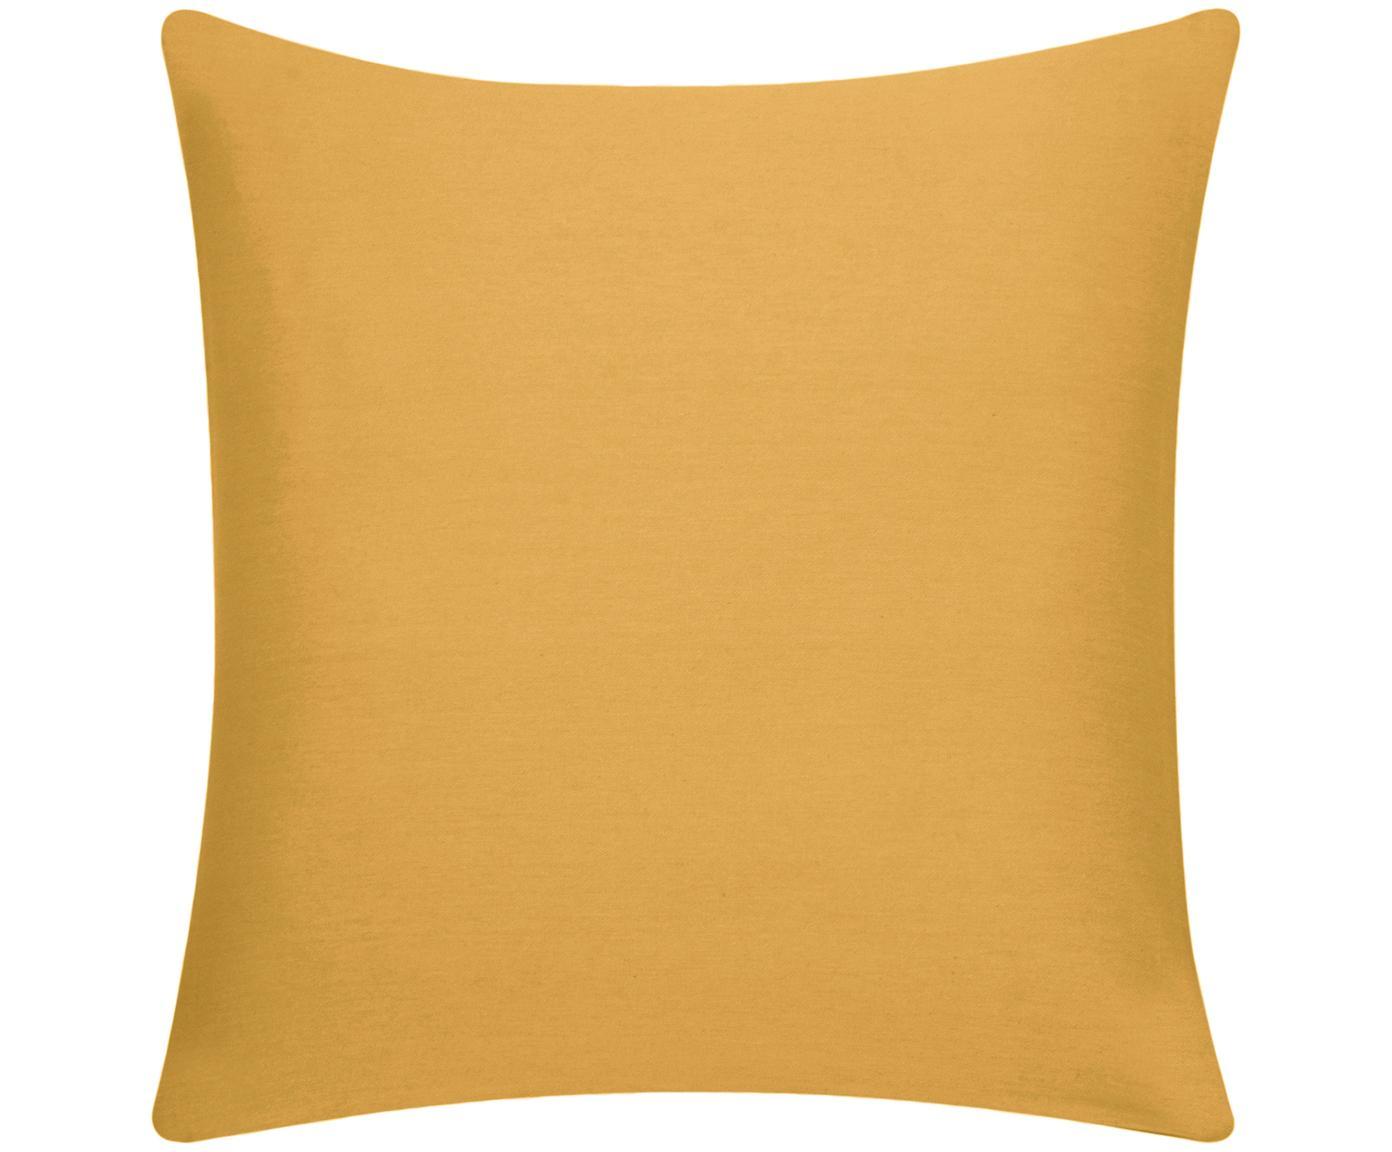 Federa arredo in giallo senape Mads, Cotone, Giallo senape, Larg. 40 x Lung. 40 cm